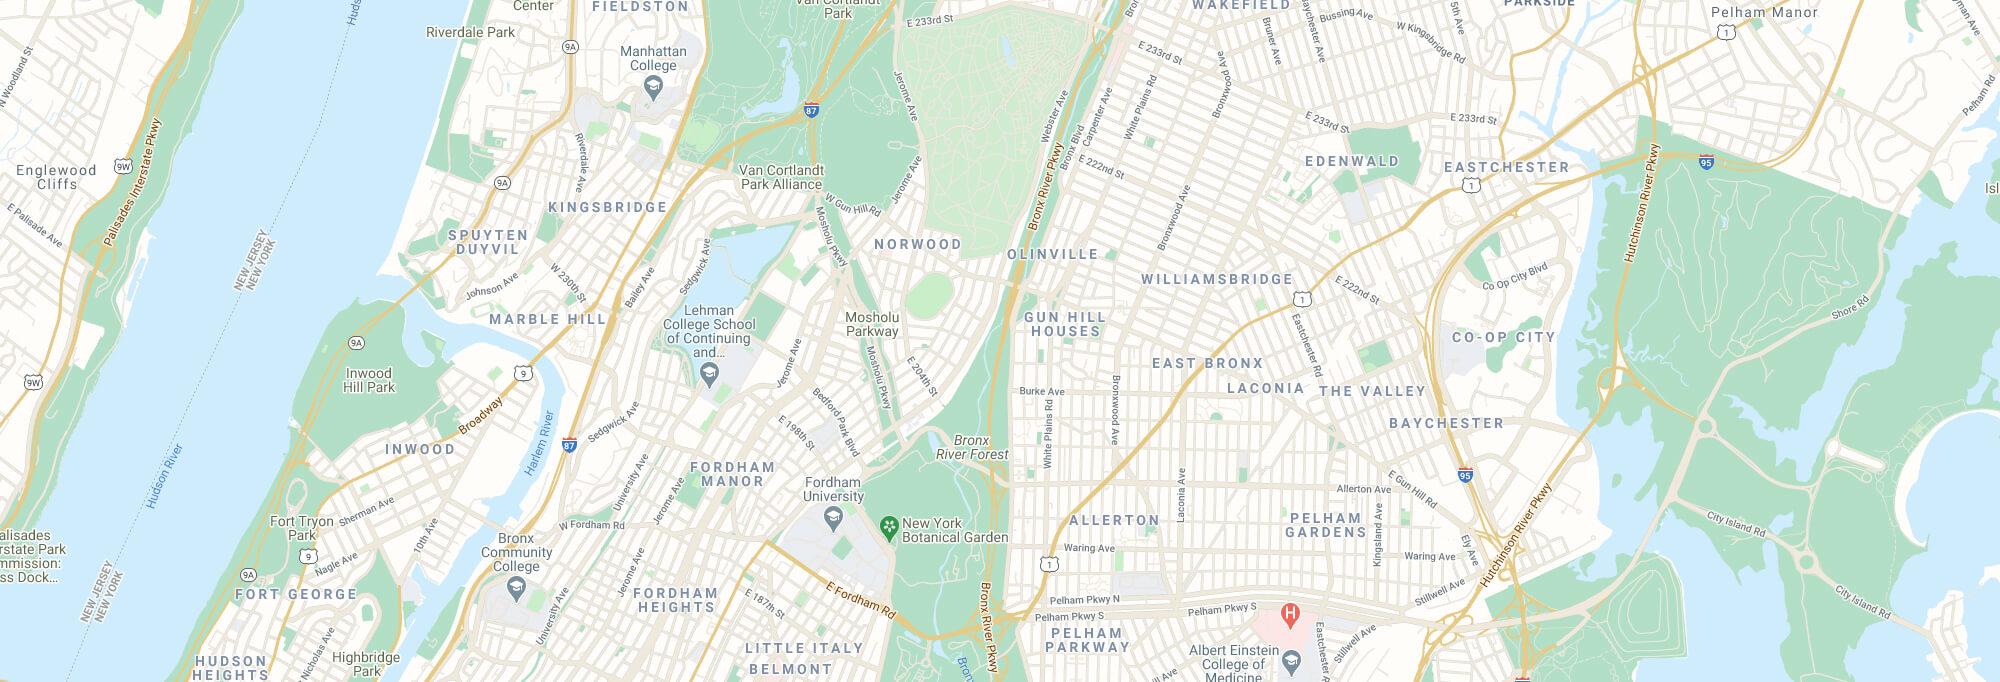 The Bronx city map